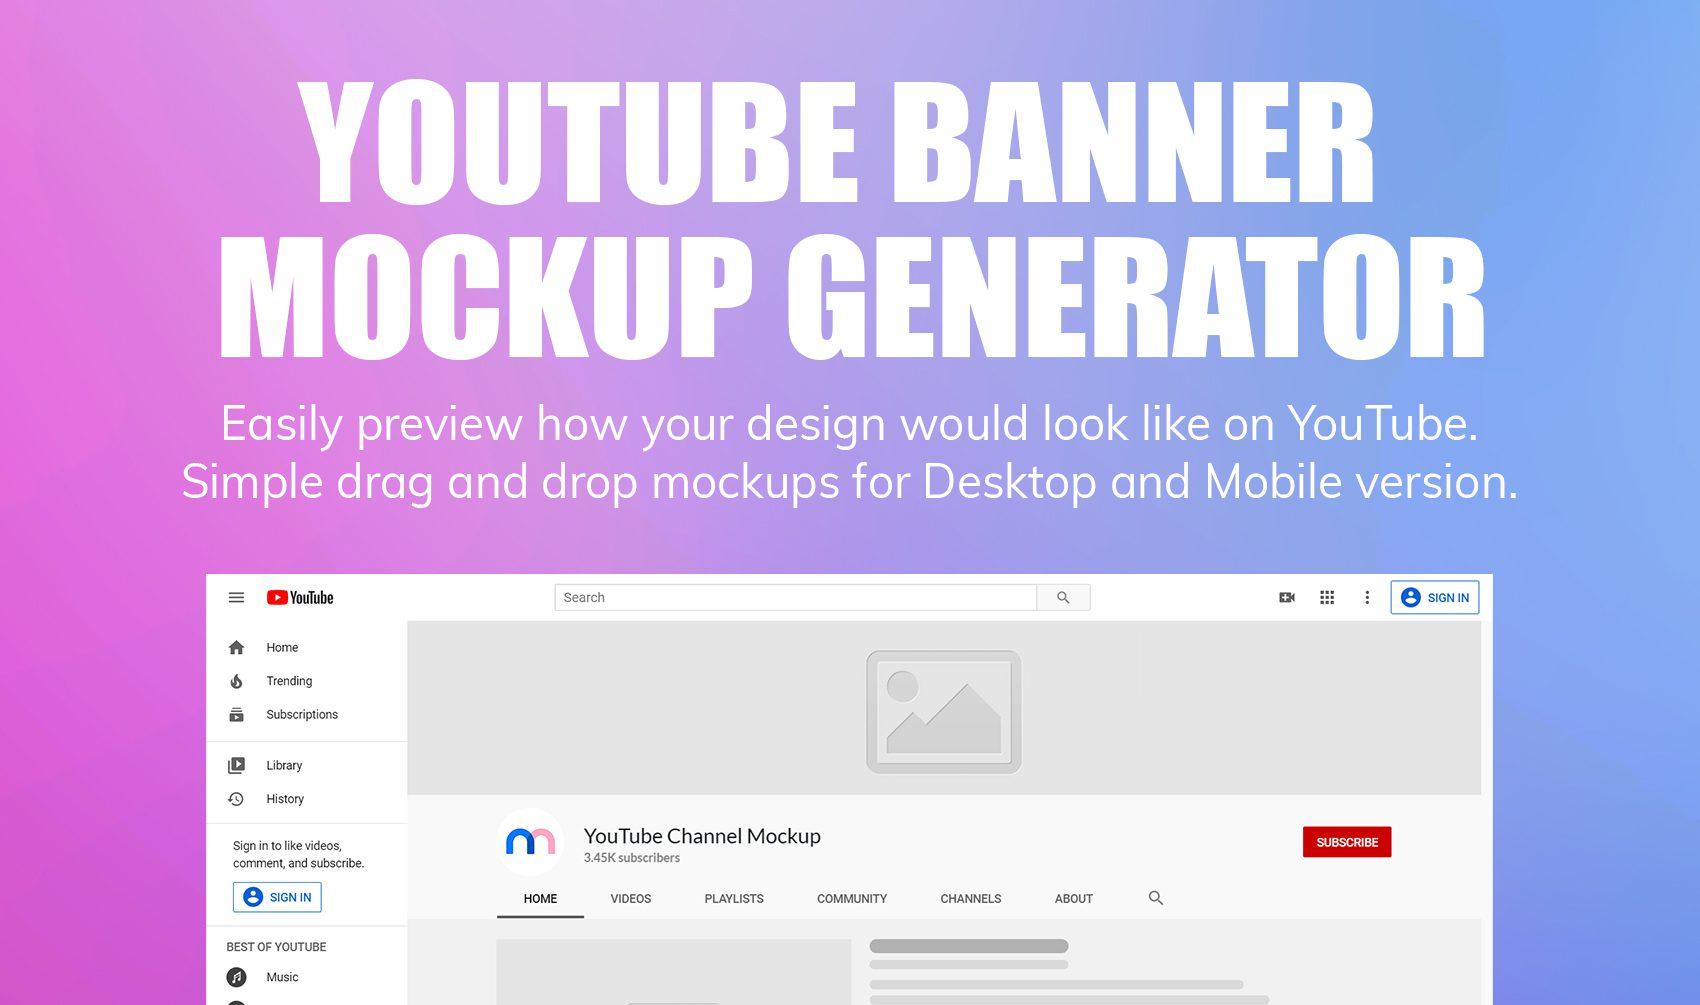 Youtube-banner-mockup-generator